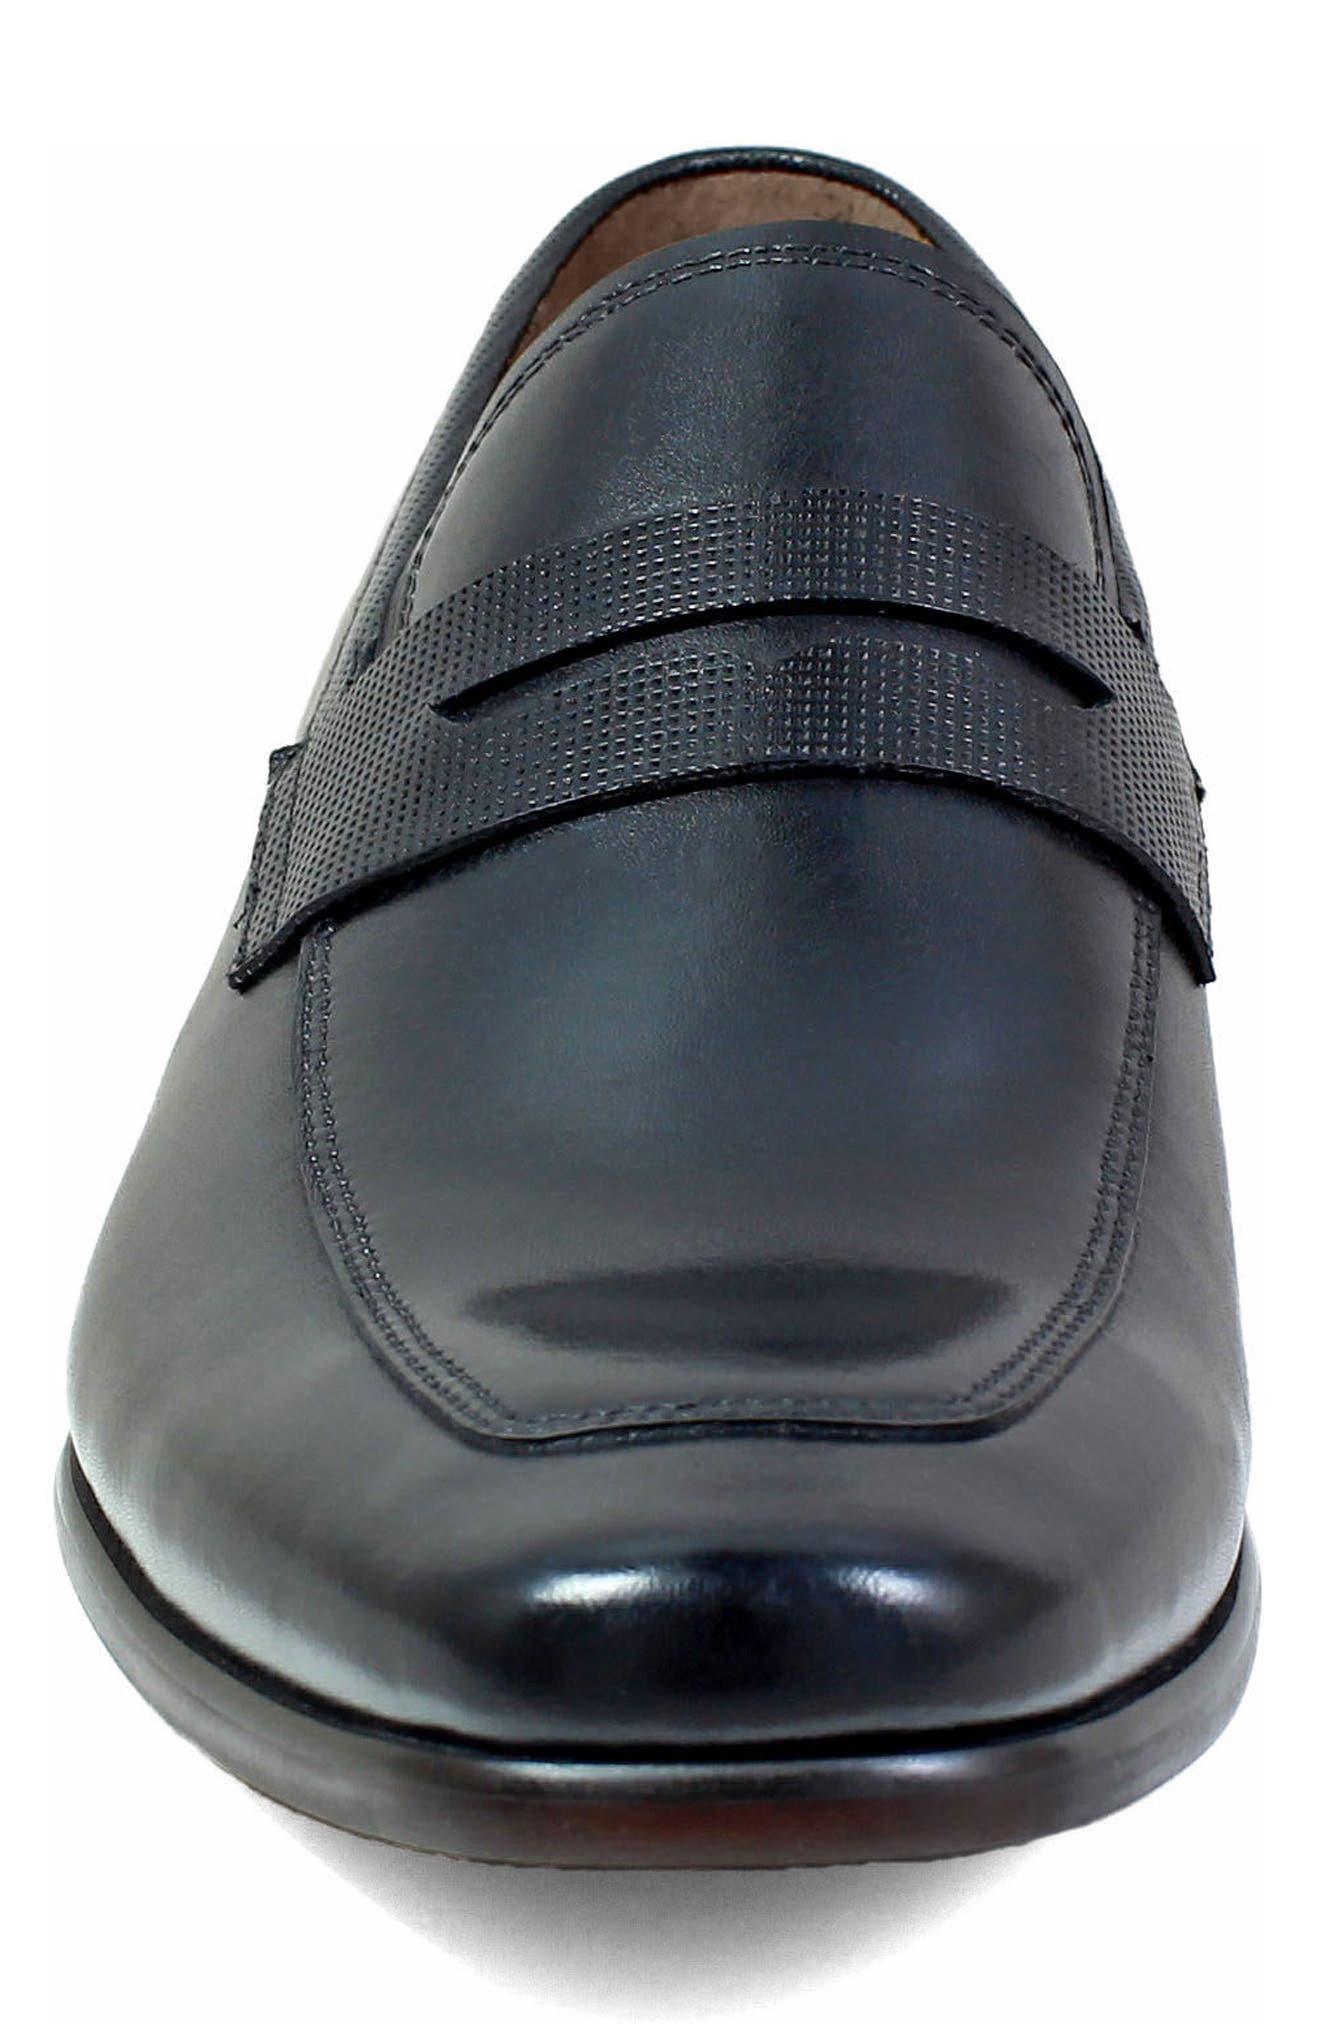 FLORSHEIM, Postino Apron Toe Textured Penny Loafer, Alternate thumbnail 3, color, BLACK LEATHER